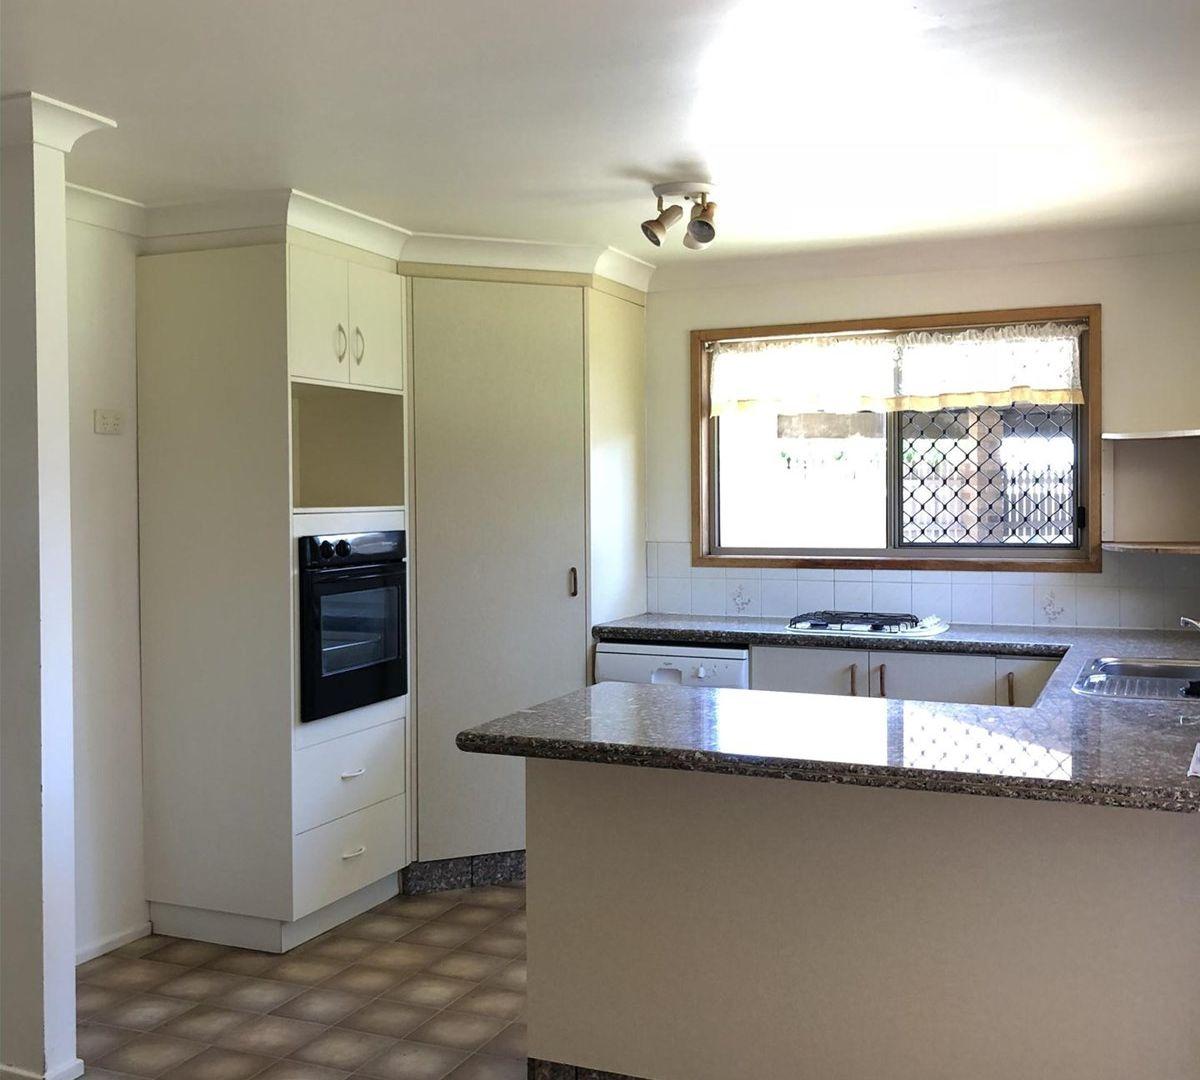 14 Reisling Court, Wilsonton QLD 4350, Image 1